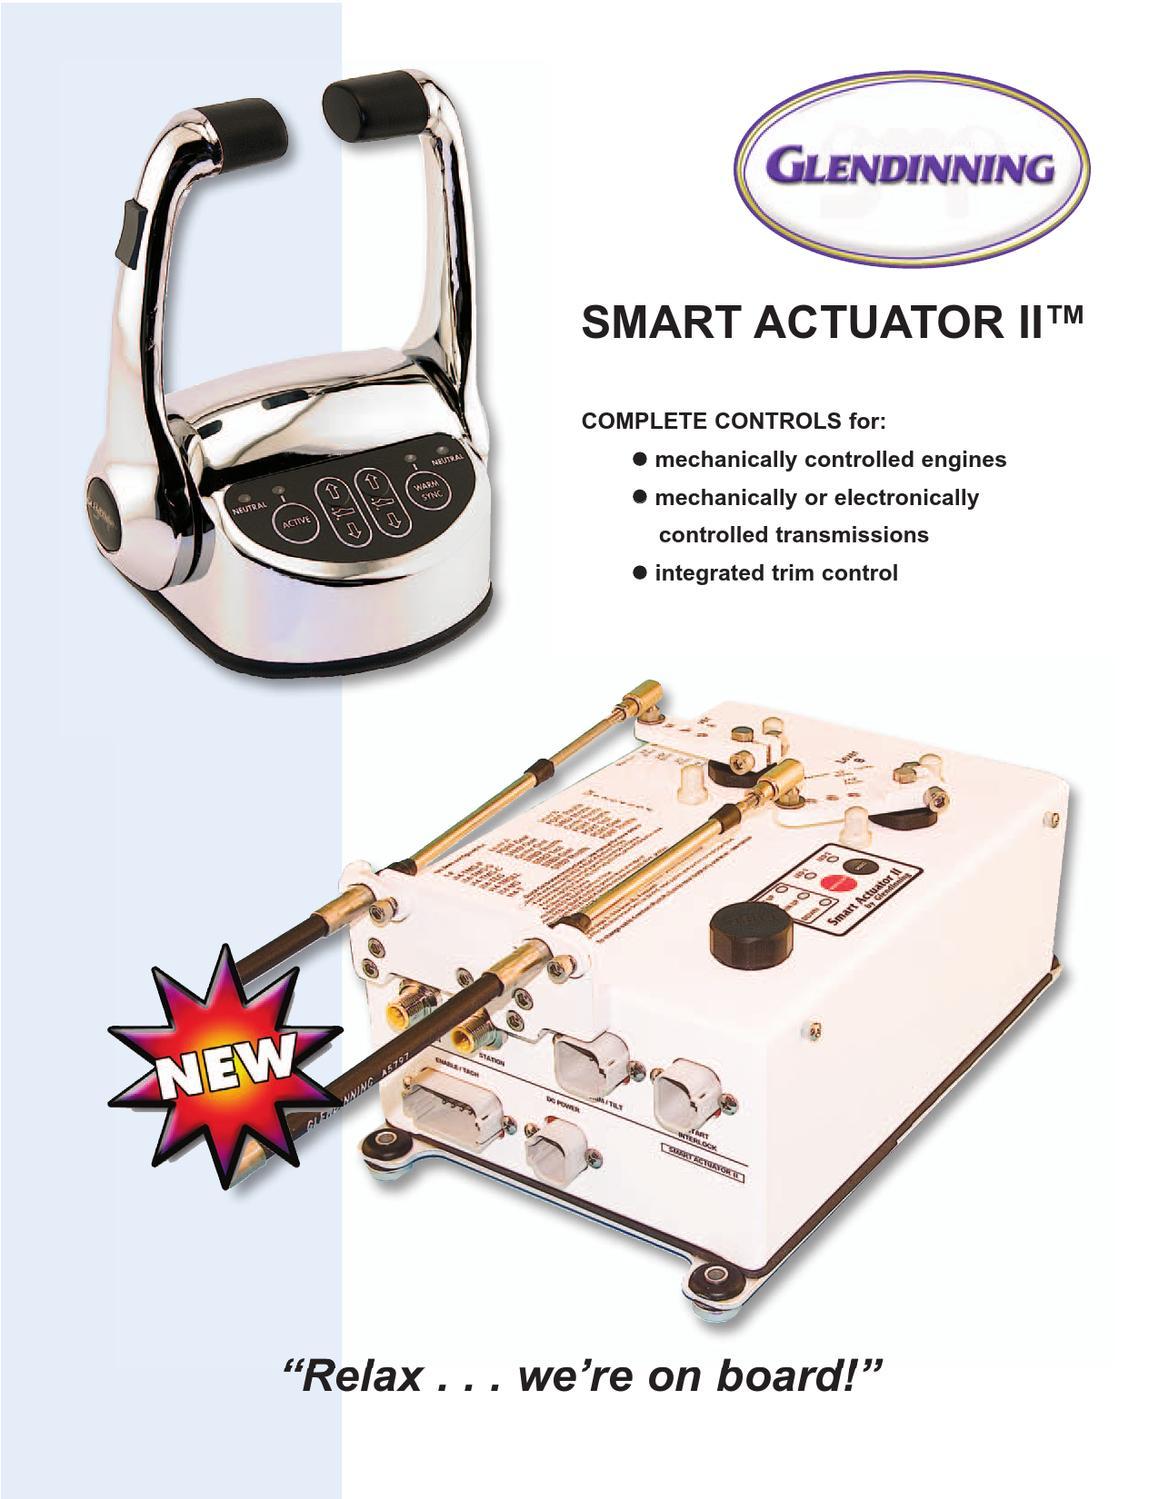 smart actuator ii by glendinning marine. Black Bedroom Furniture Sets. Home Design Ideas